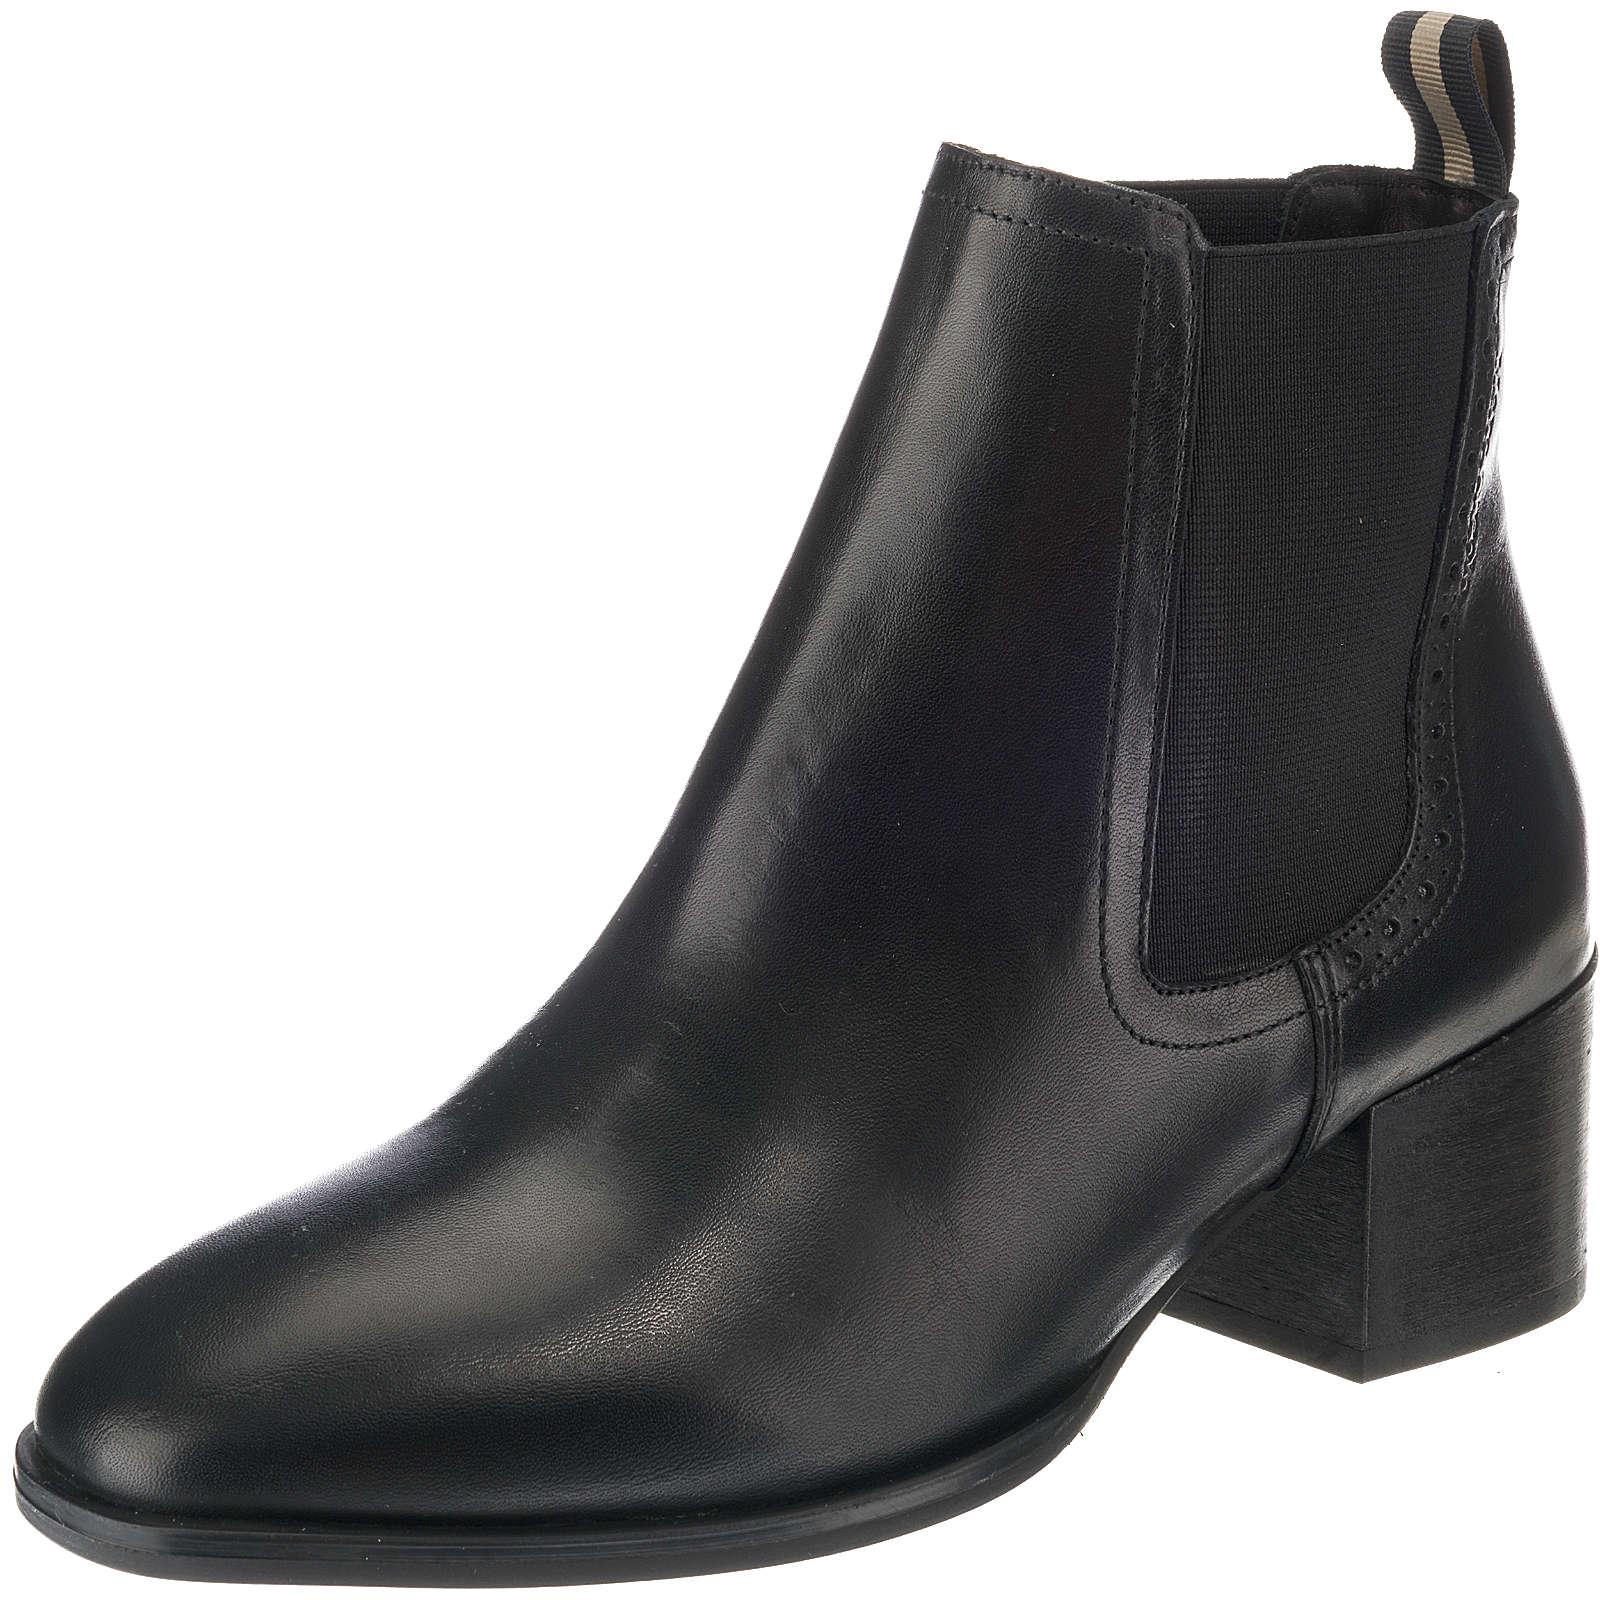 MARC O´POLO Chelsea Boots schwarz Damen Gr. 40,5